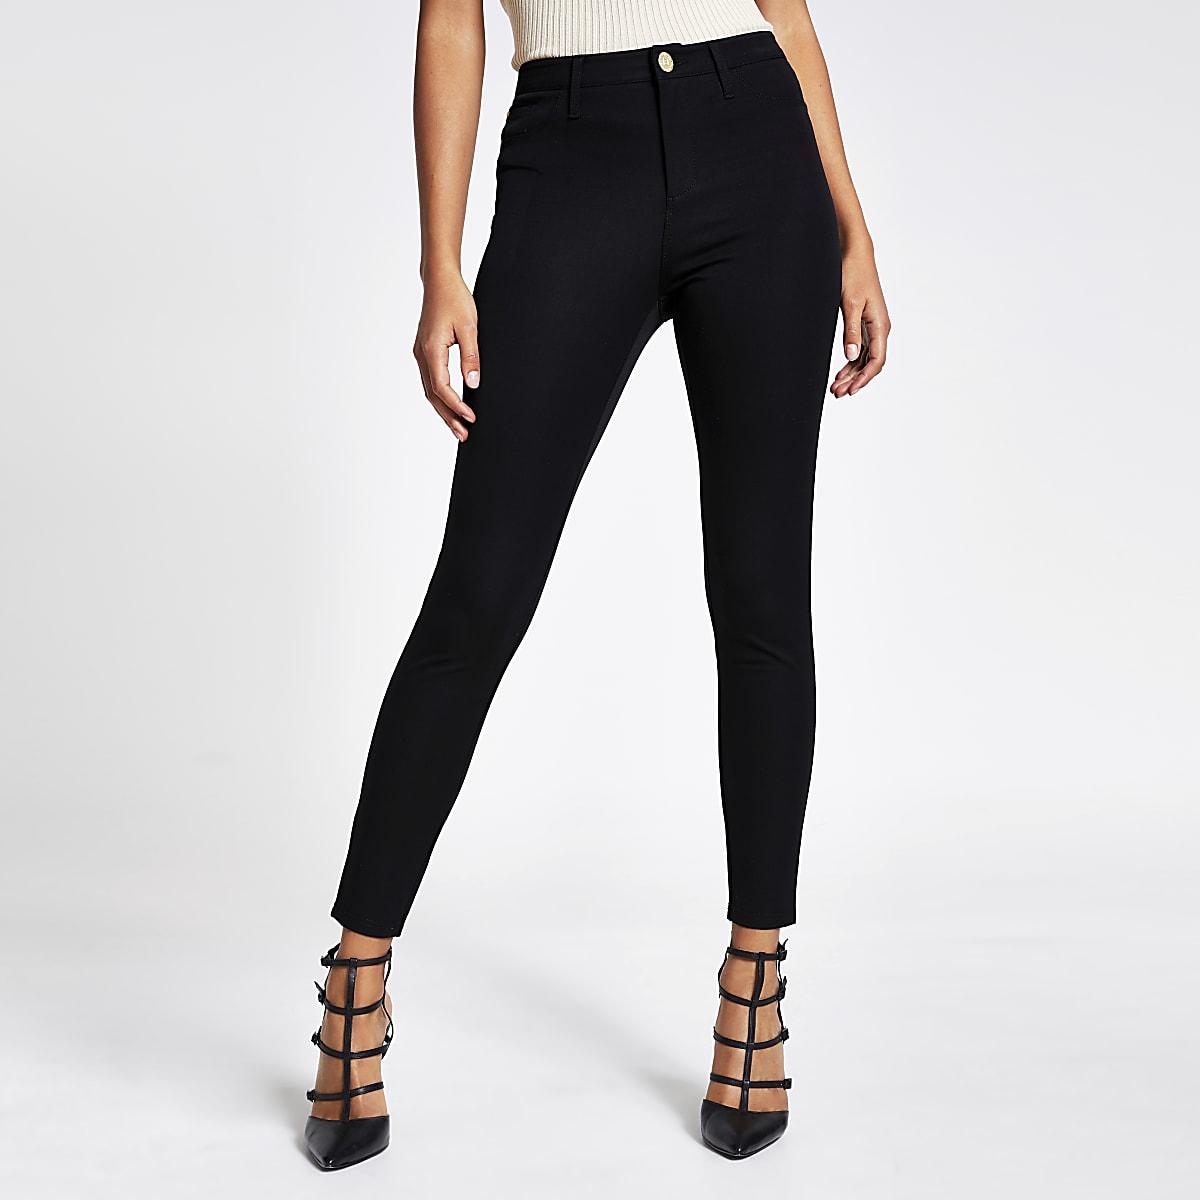 Molly - Pantalons skinnynoirs en sergé